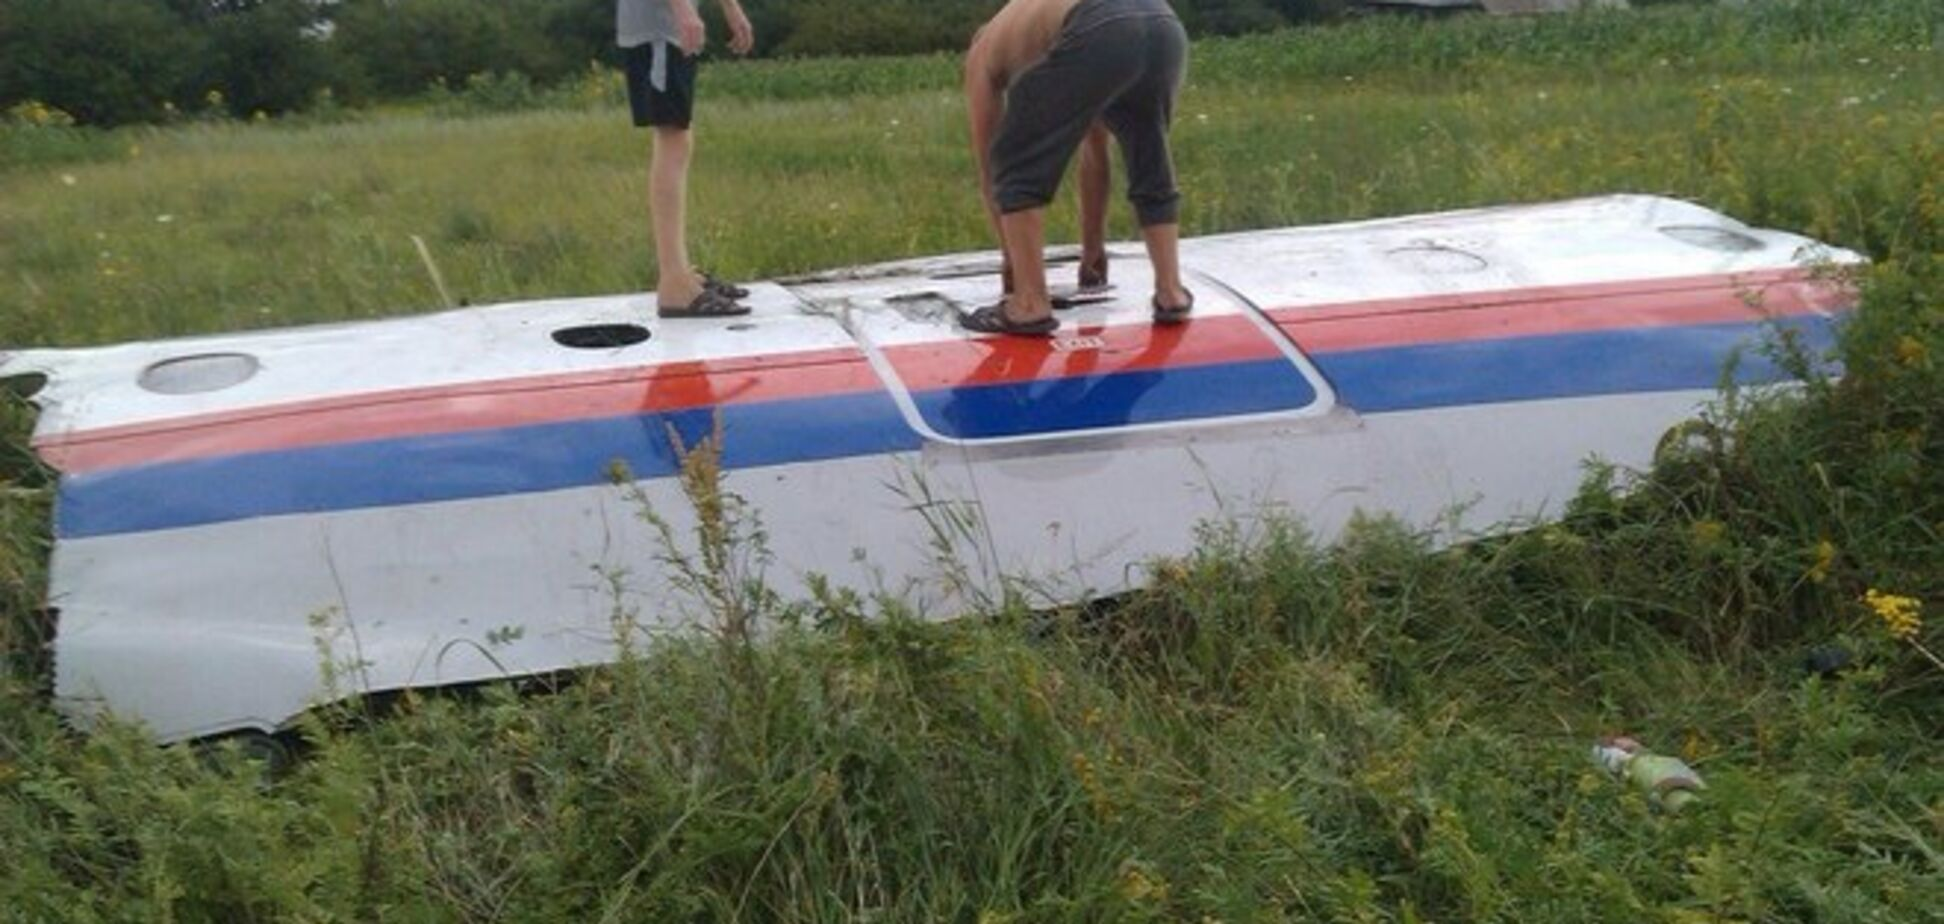 Над Донбассом сбит Boeing-777 малайзийских авиалиний